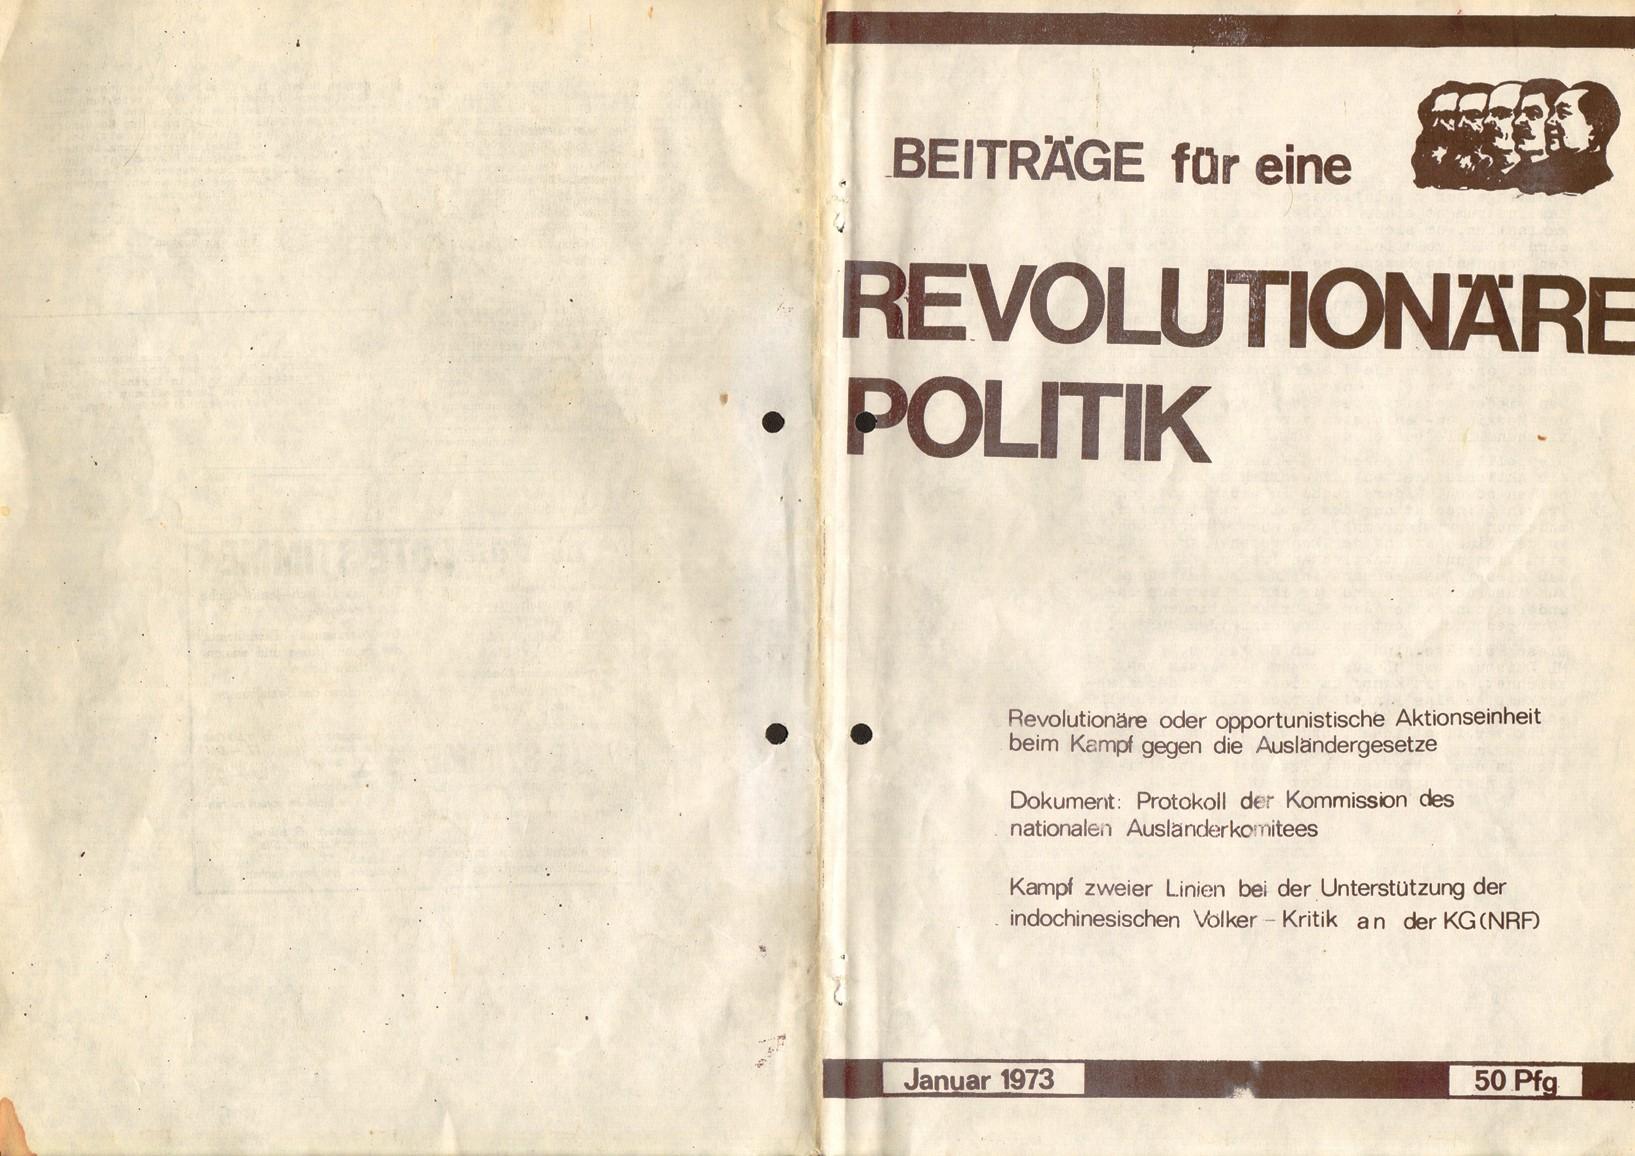 Aachen_Beitraege_revolutionaere_Politik_1973_01_01